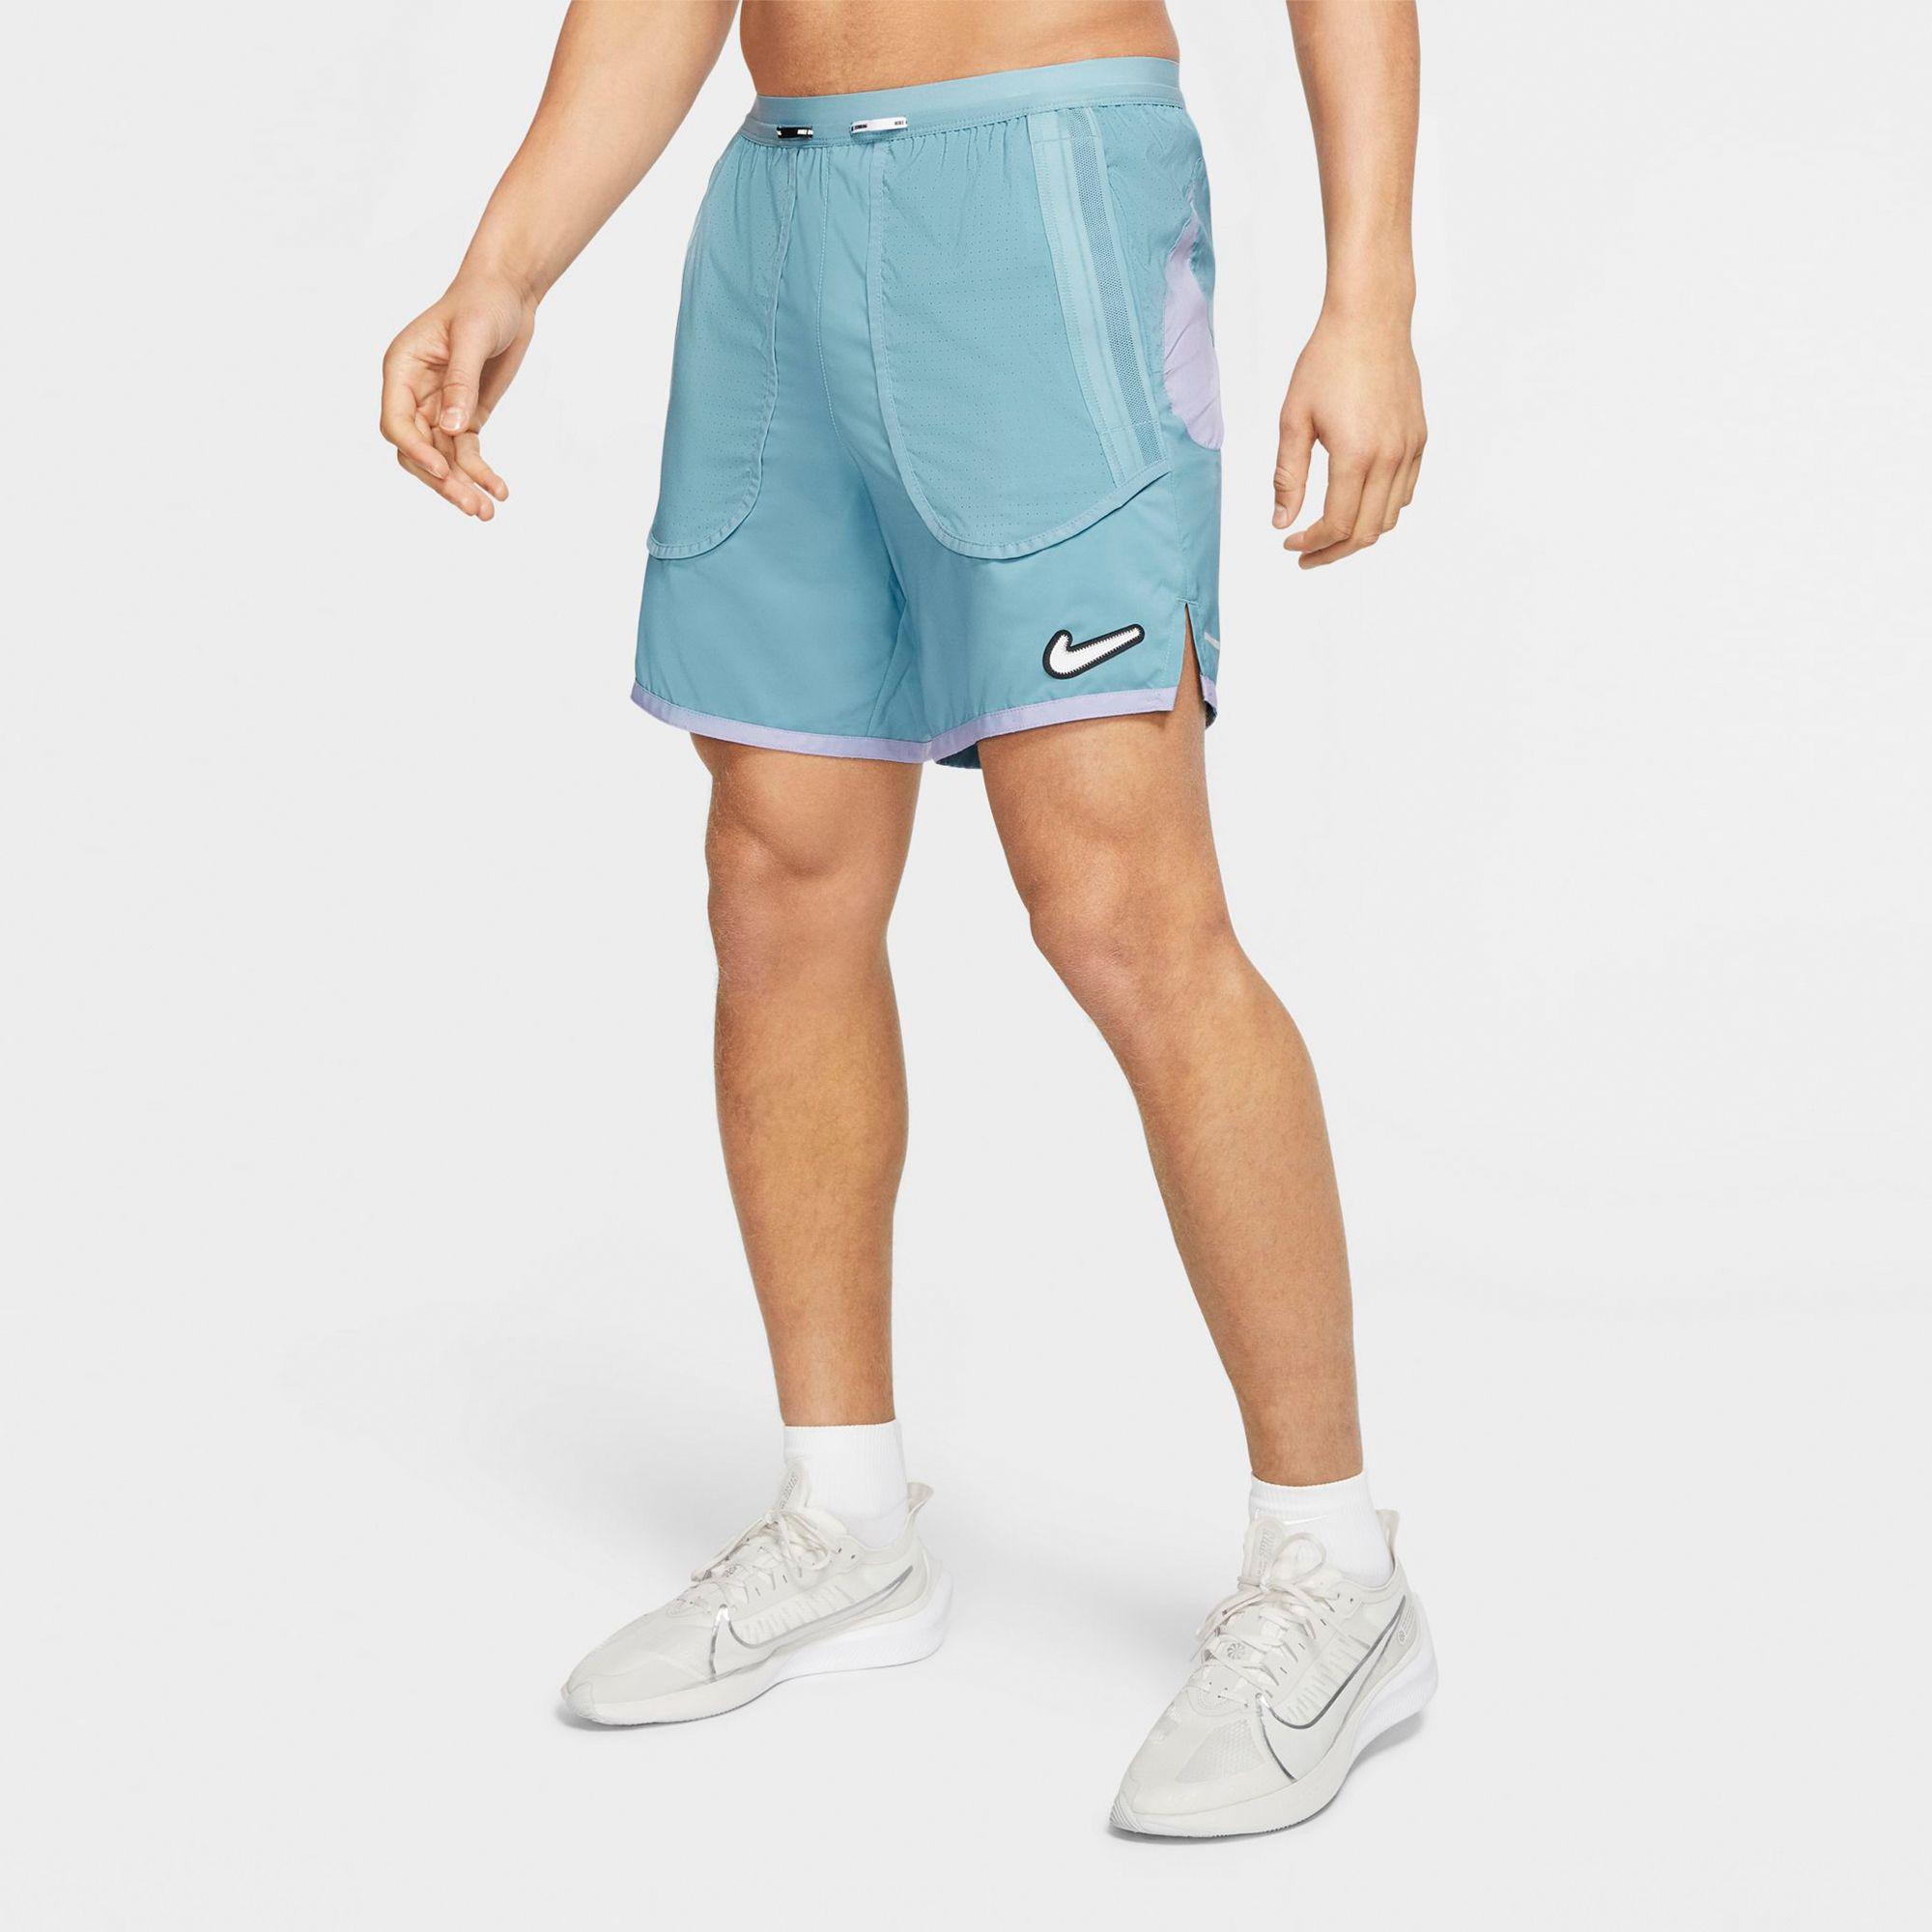 Nike Men's Flex Stride Swoosh Shorts